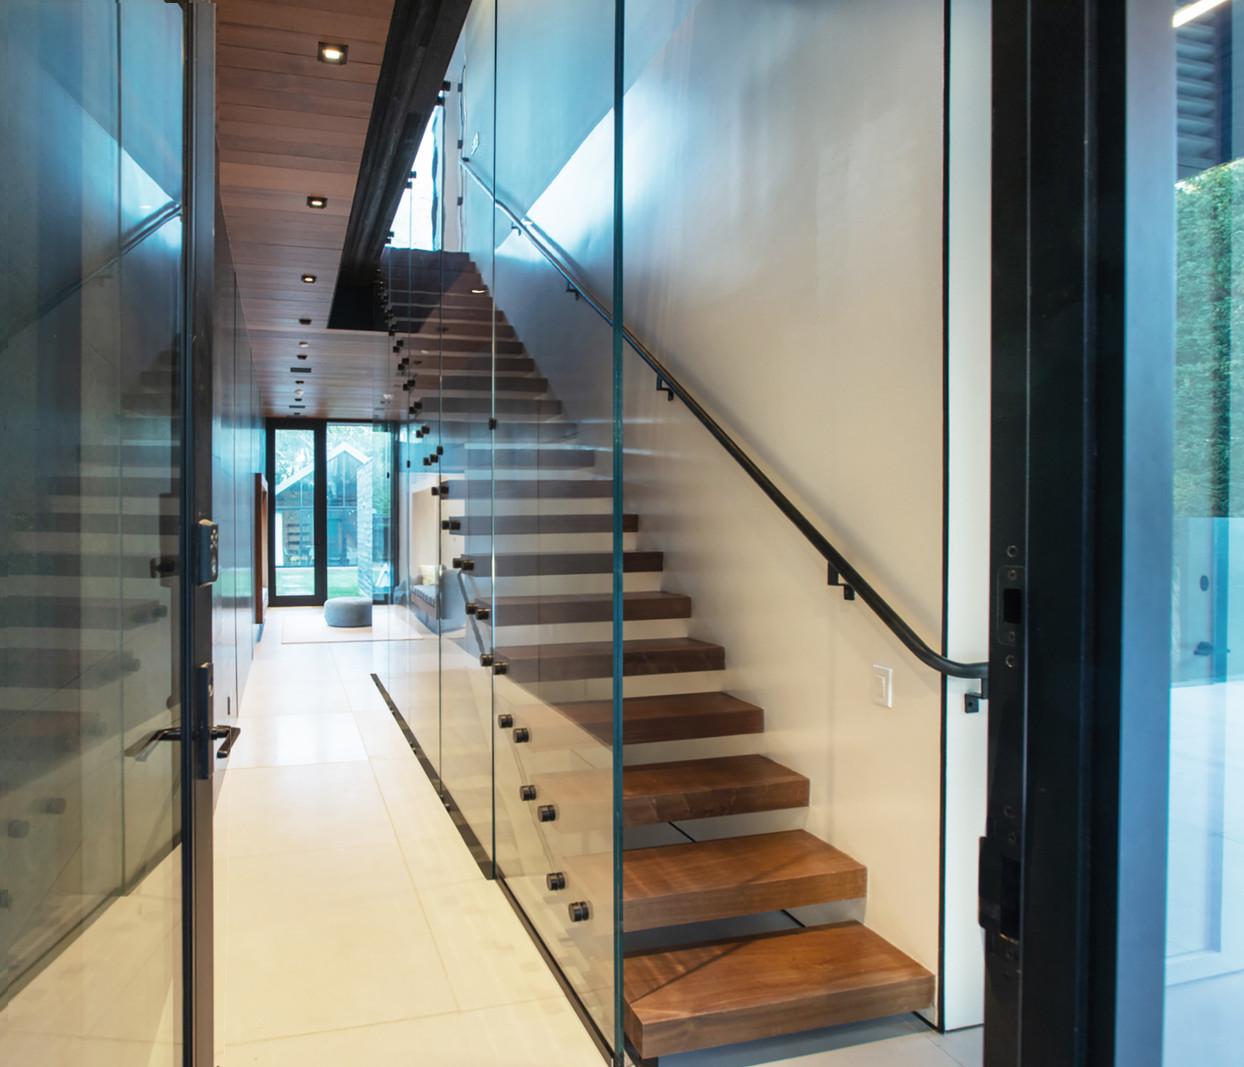 08 interior stair.jpg